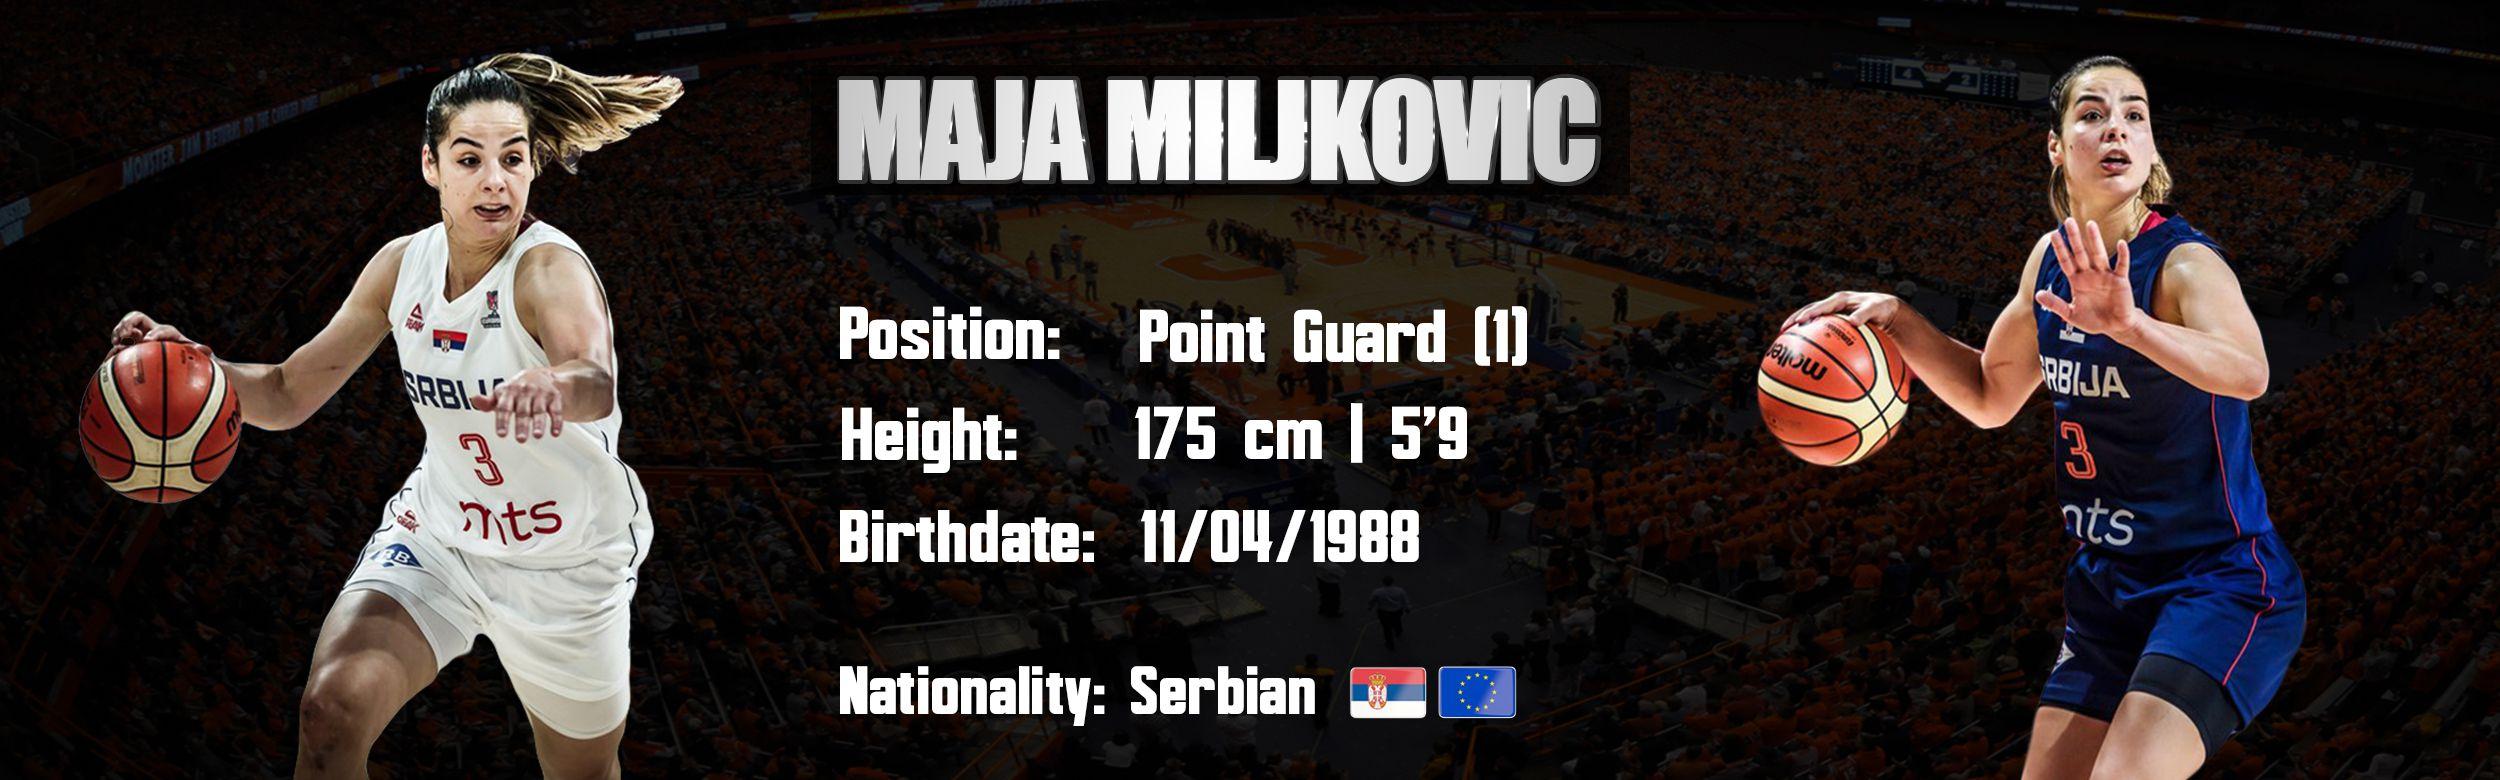 Maja Miljkovic